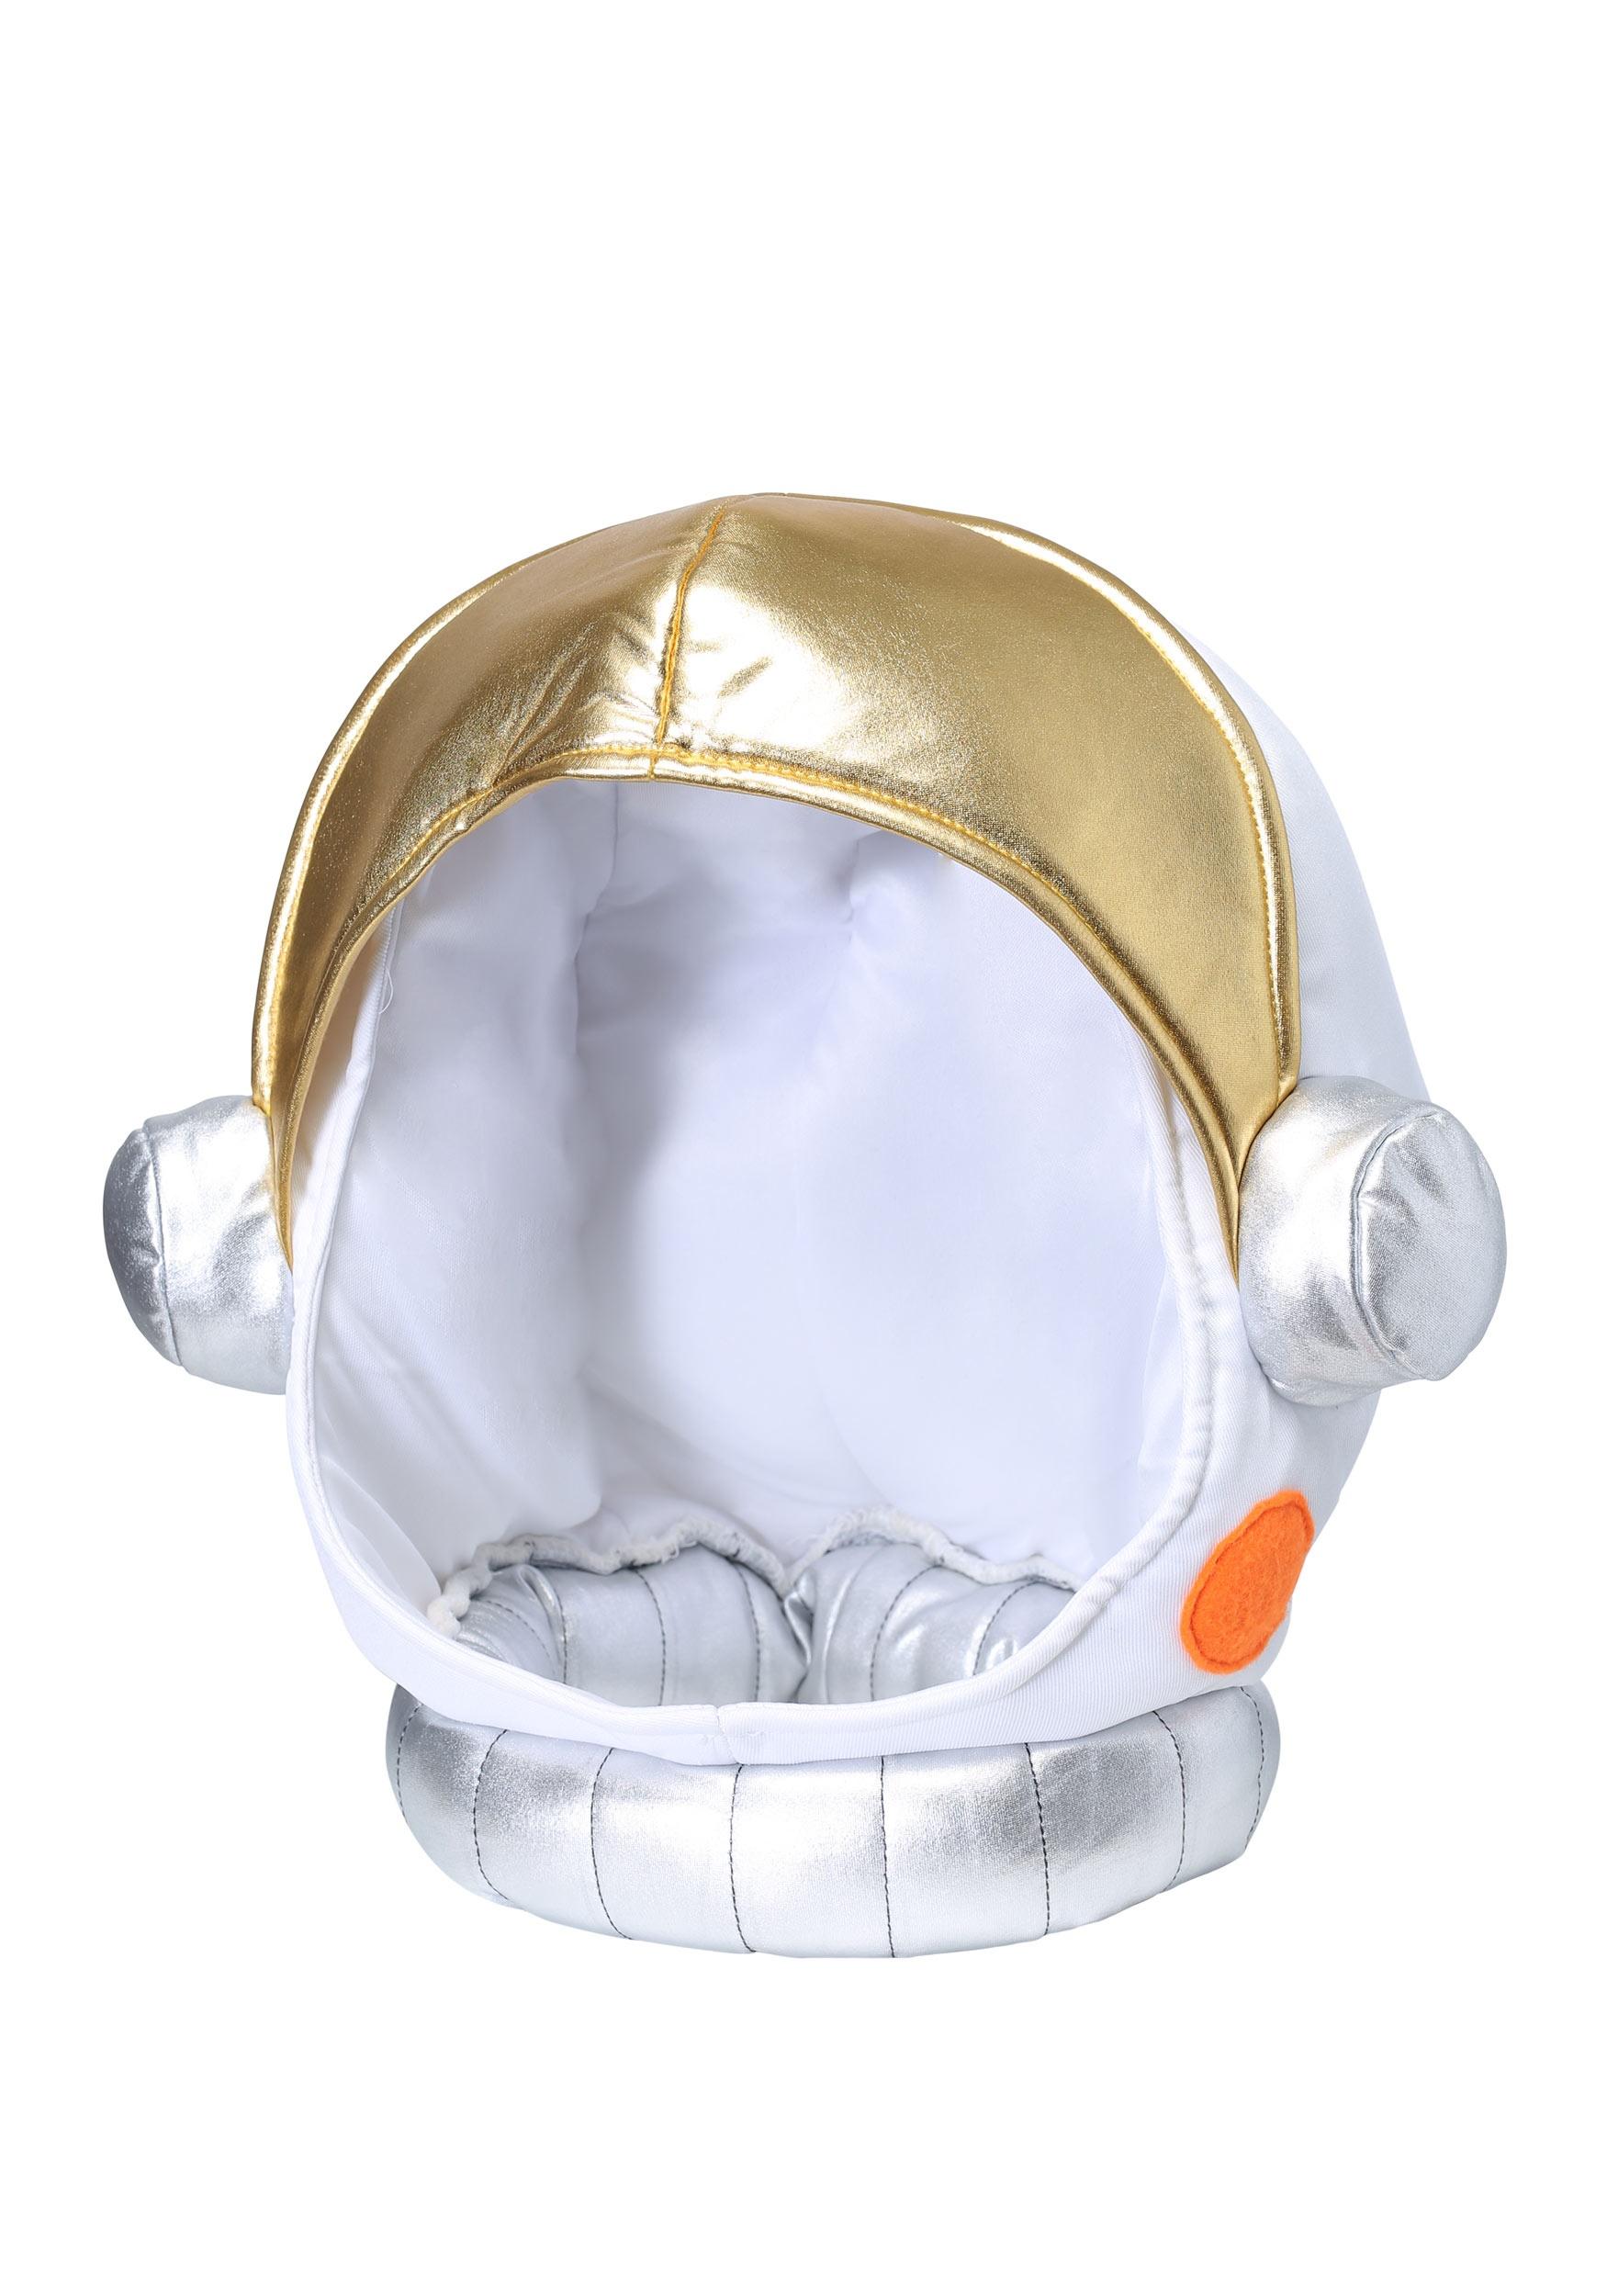 Astronaut Helmet for Adults